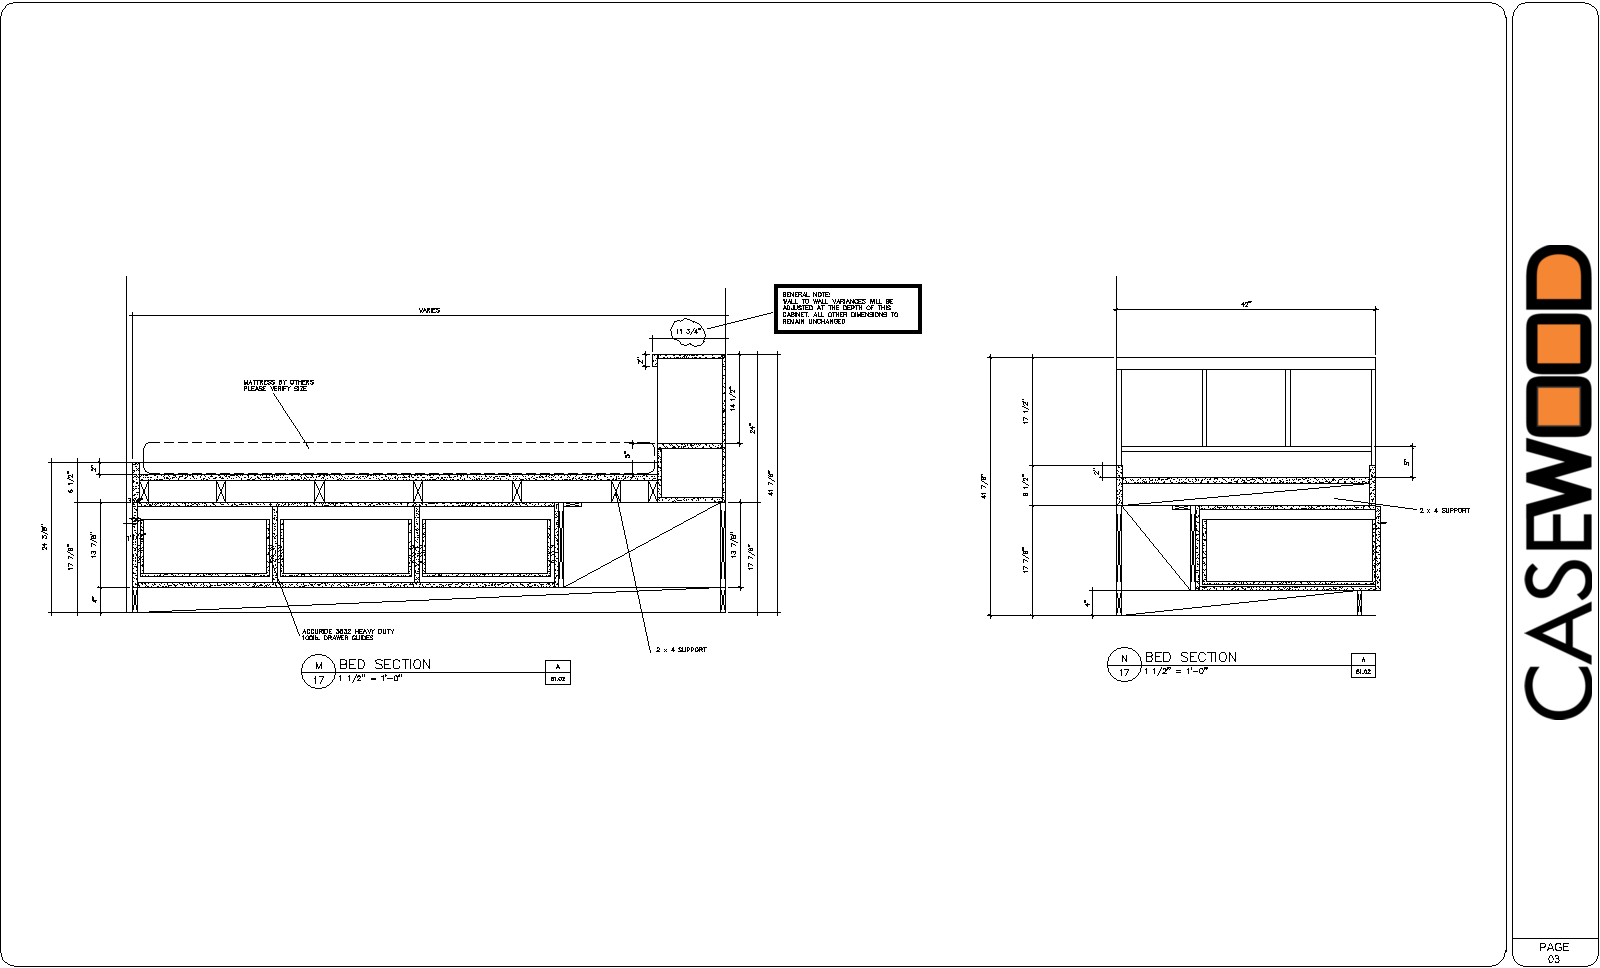 Cadkitchenplans com millwork shop drawings cabinet shop drawings - Cwsamp 03